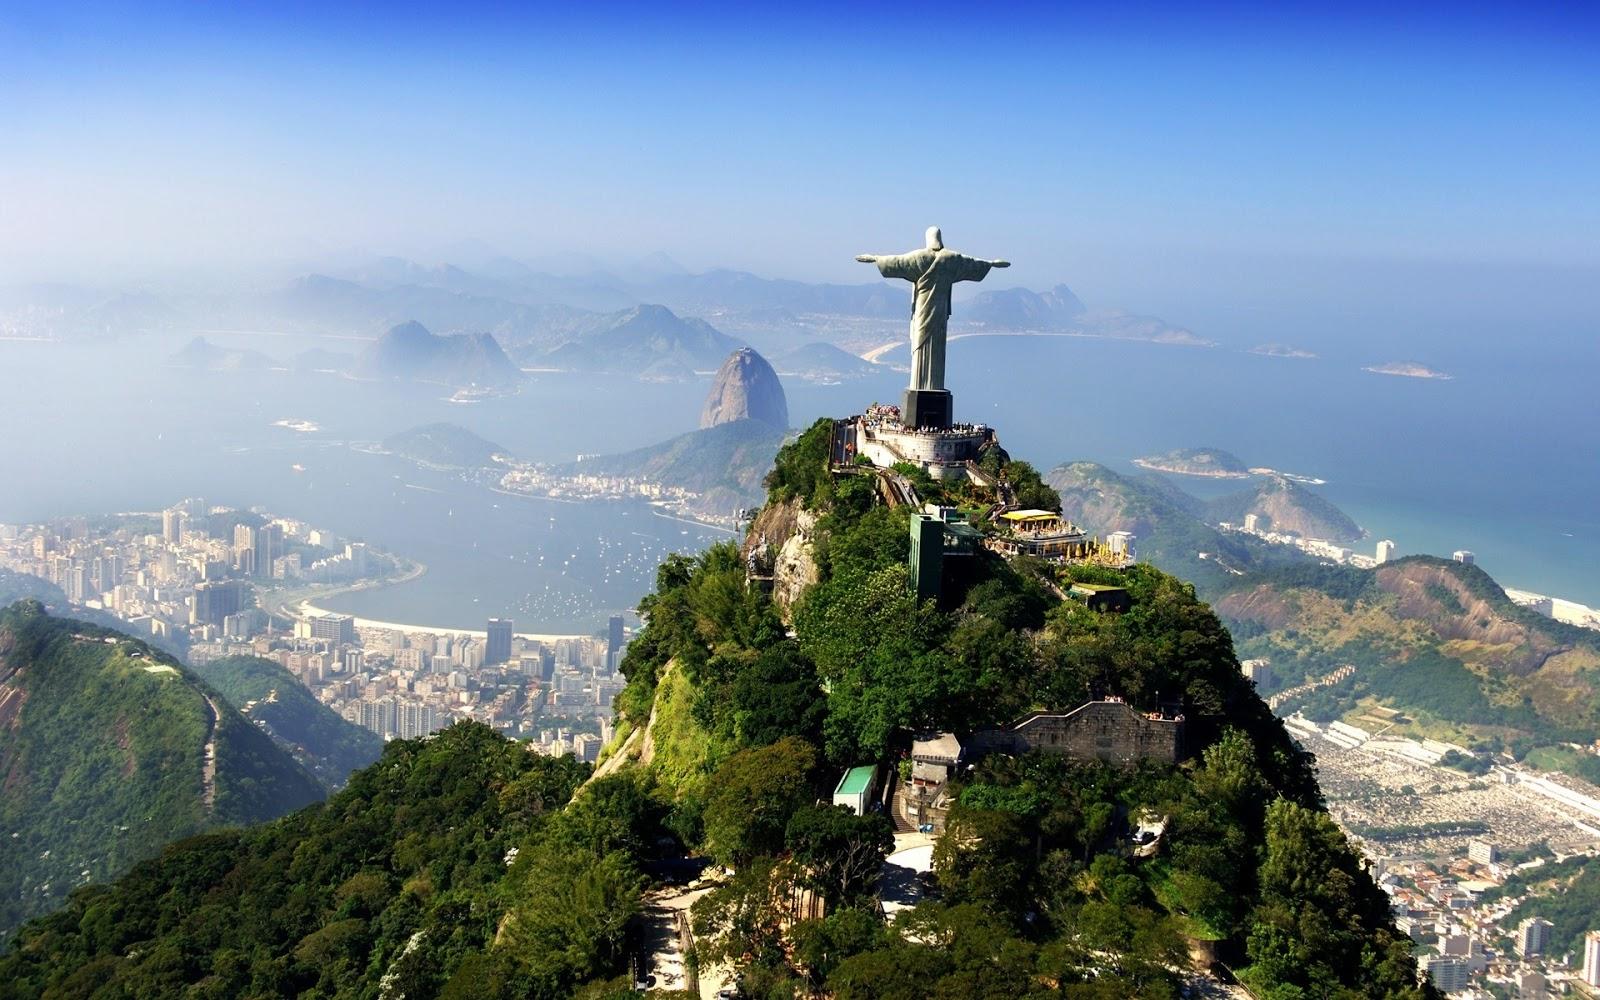 Jesus Christ Statue in Brasil Download 1600x1000